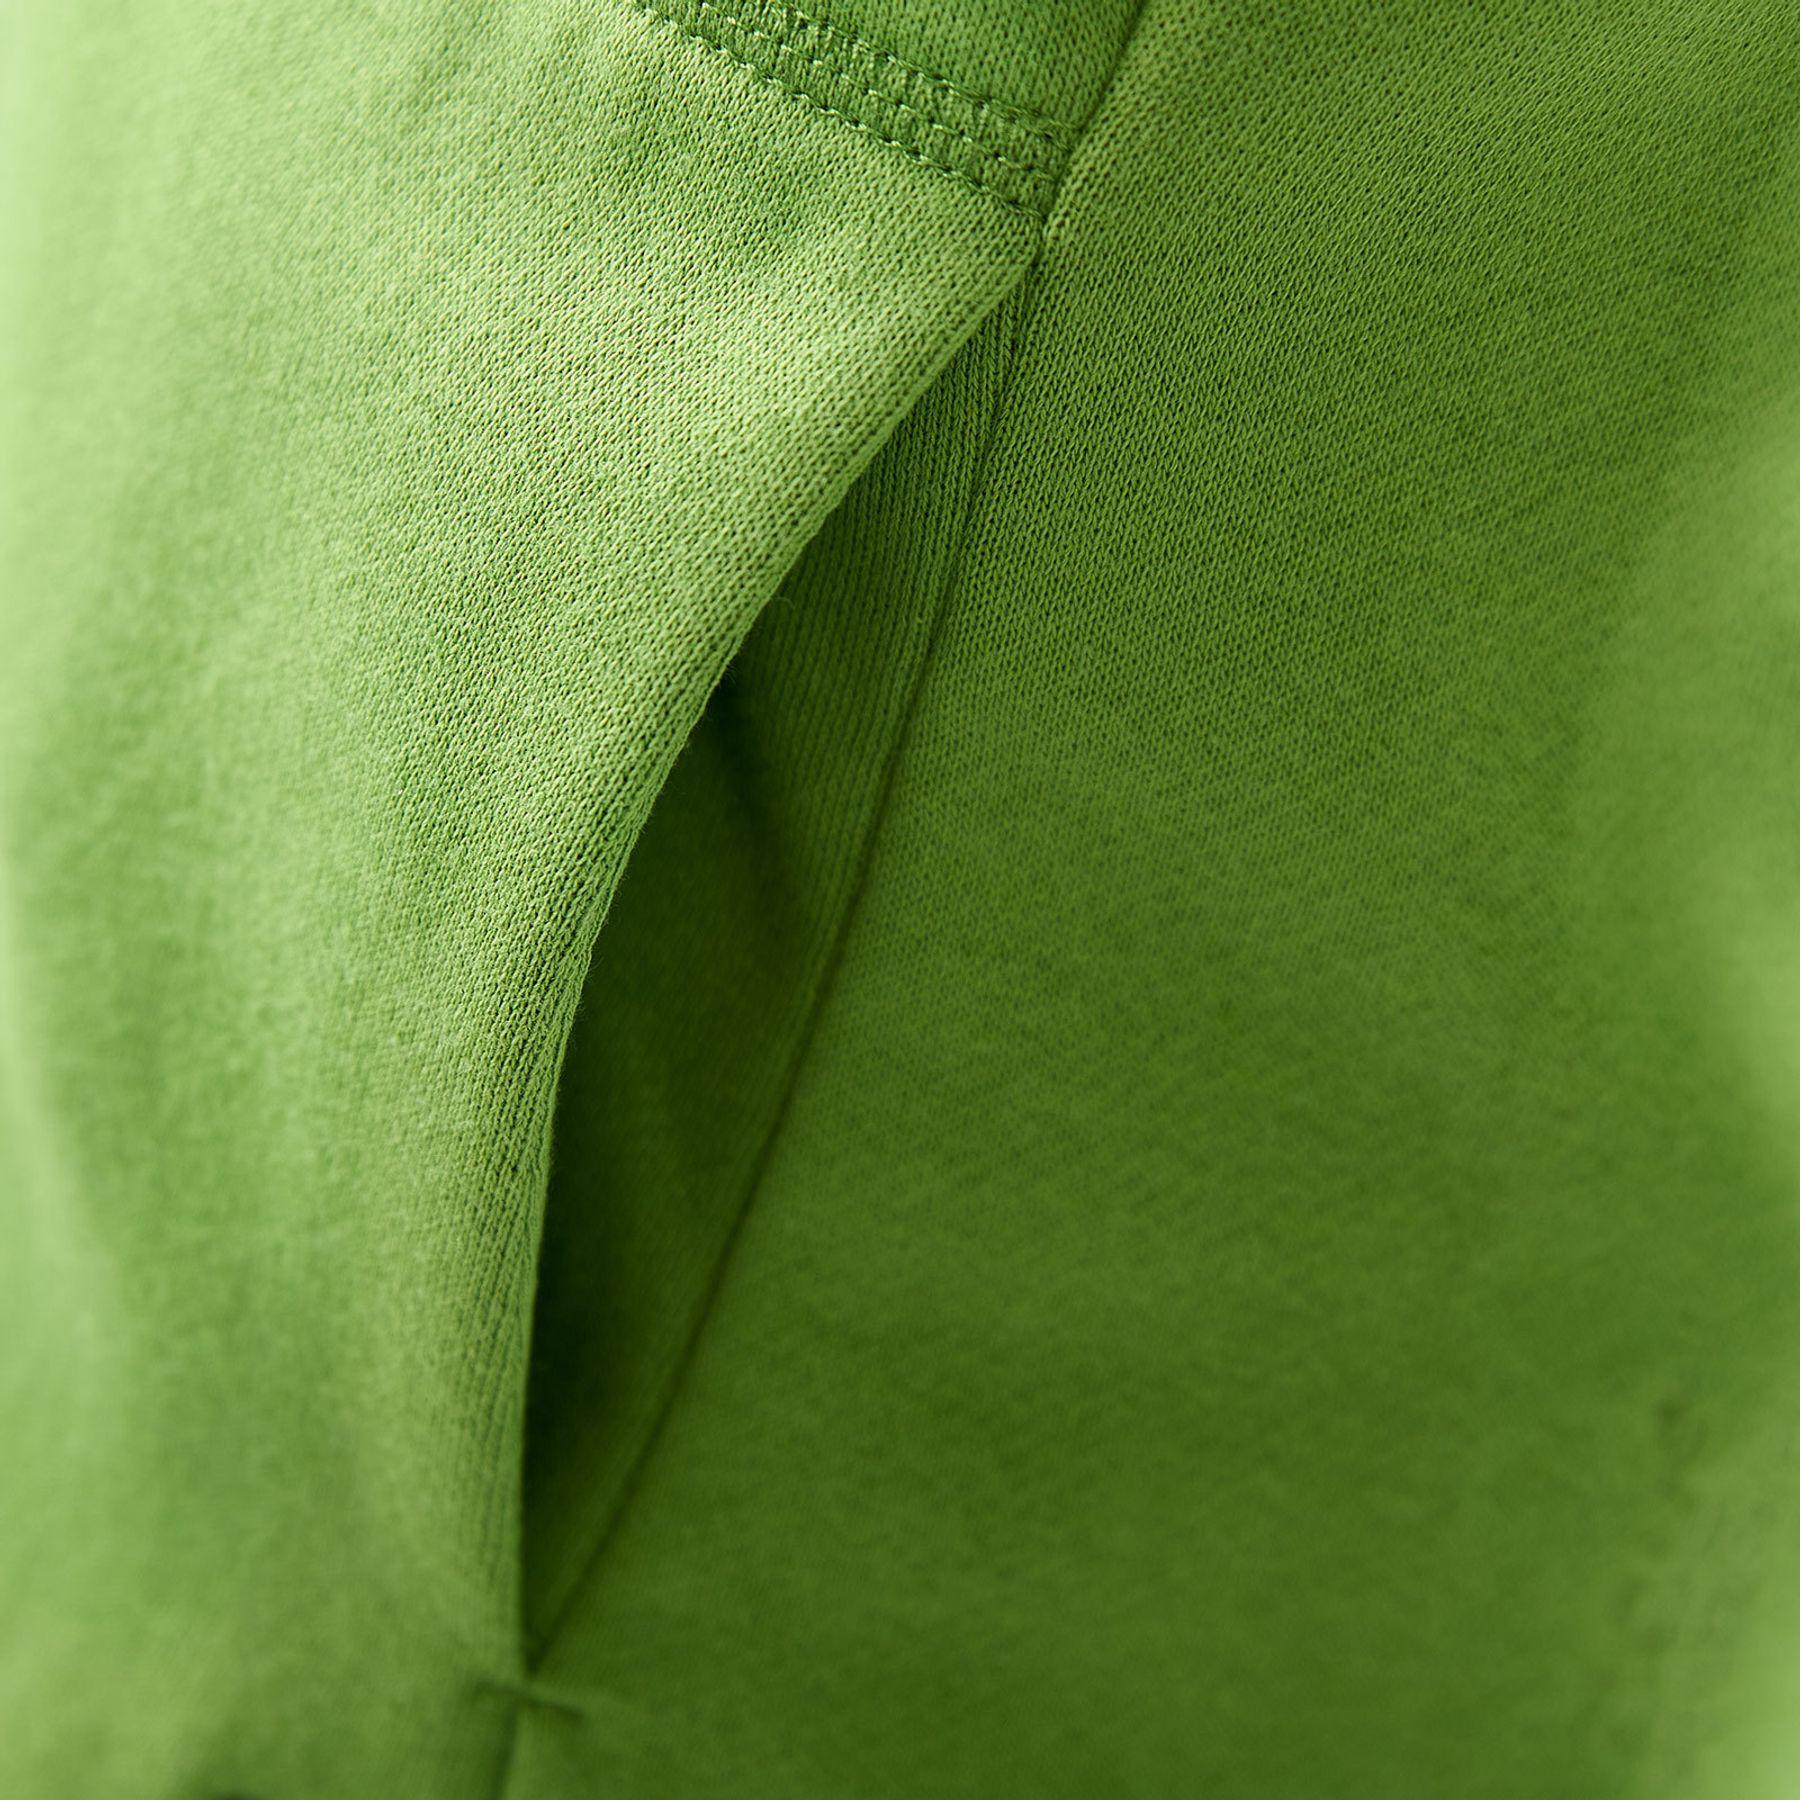 Joy - Damen Sport und Freizeit Jacke in mehreren Farben, Paulina (34500 A) – Bild 3